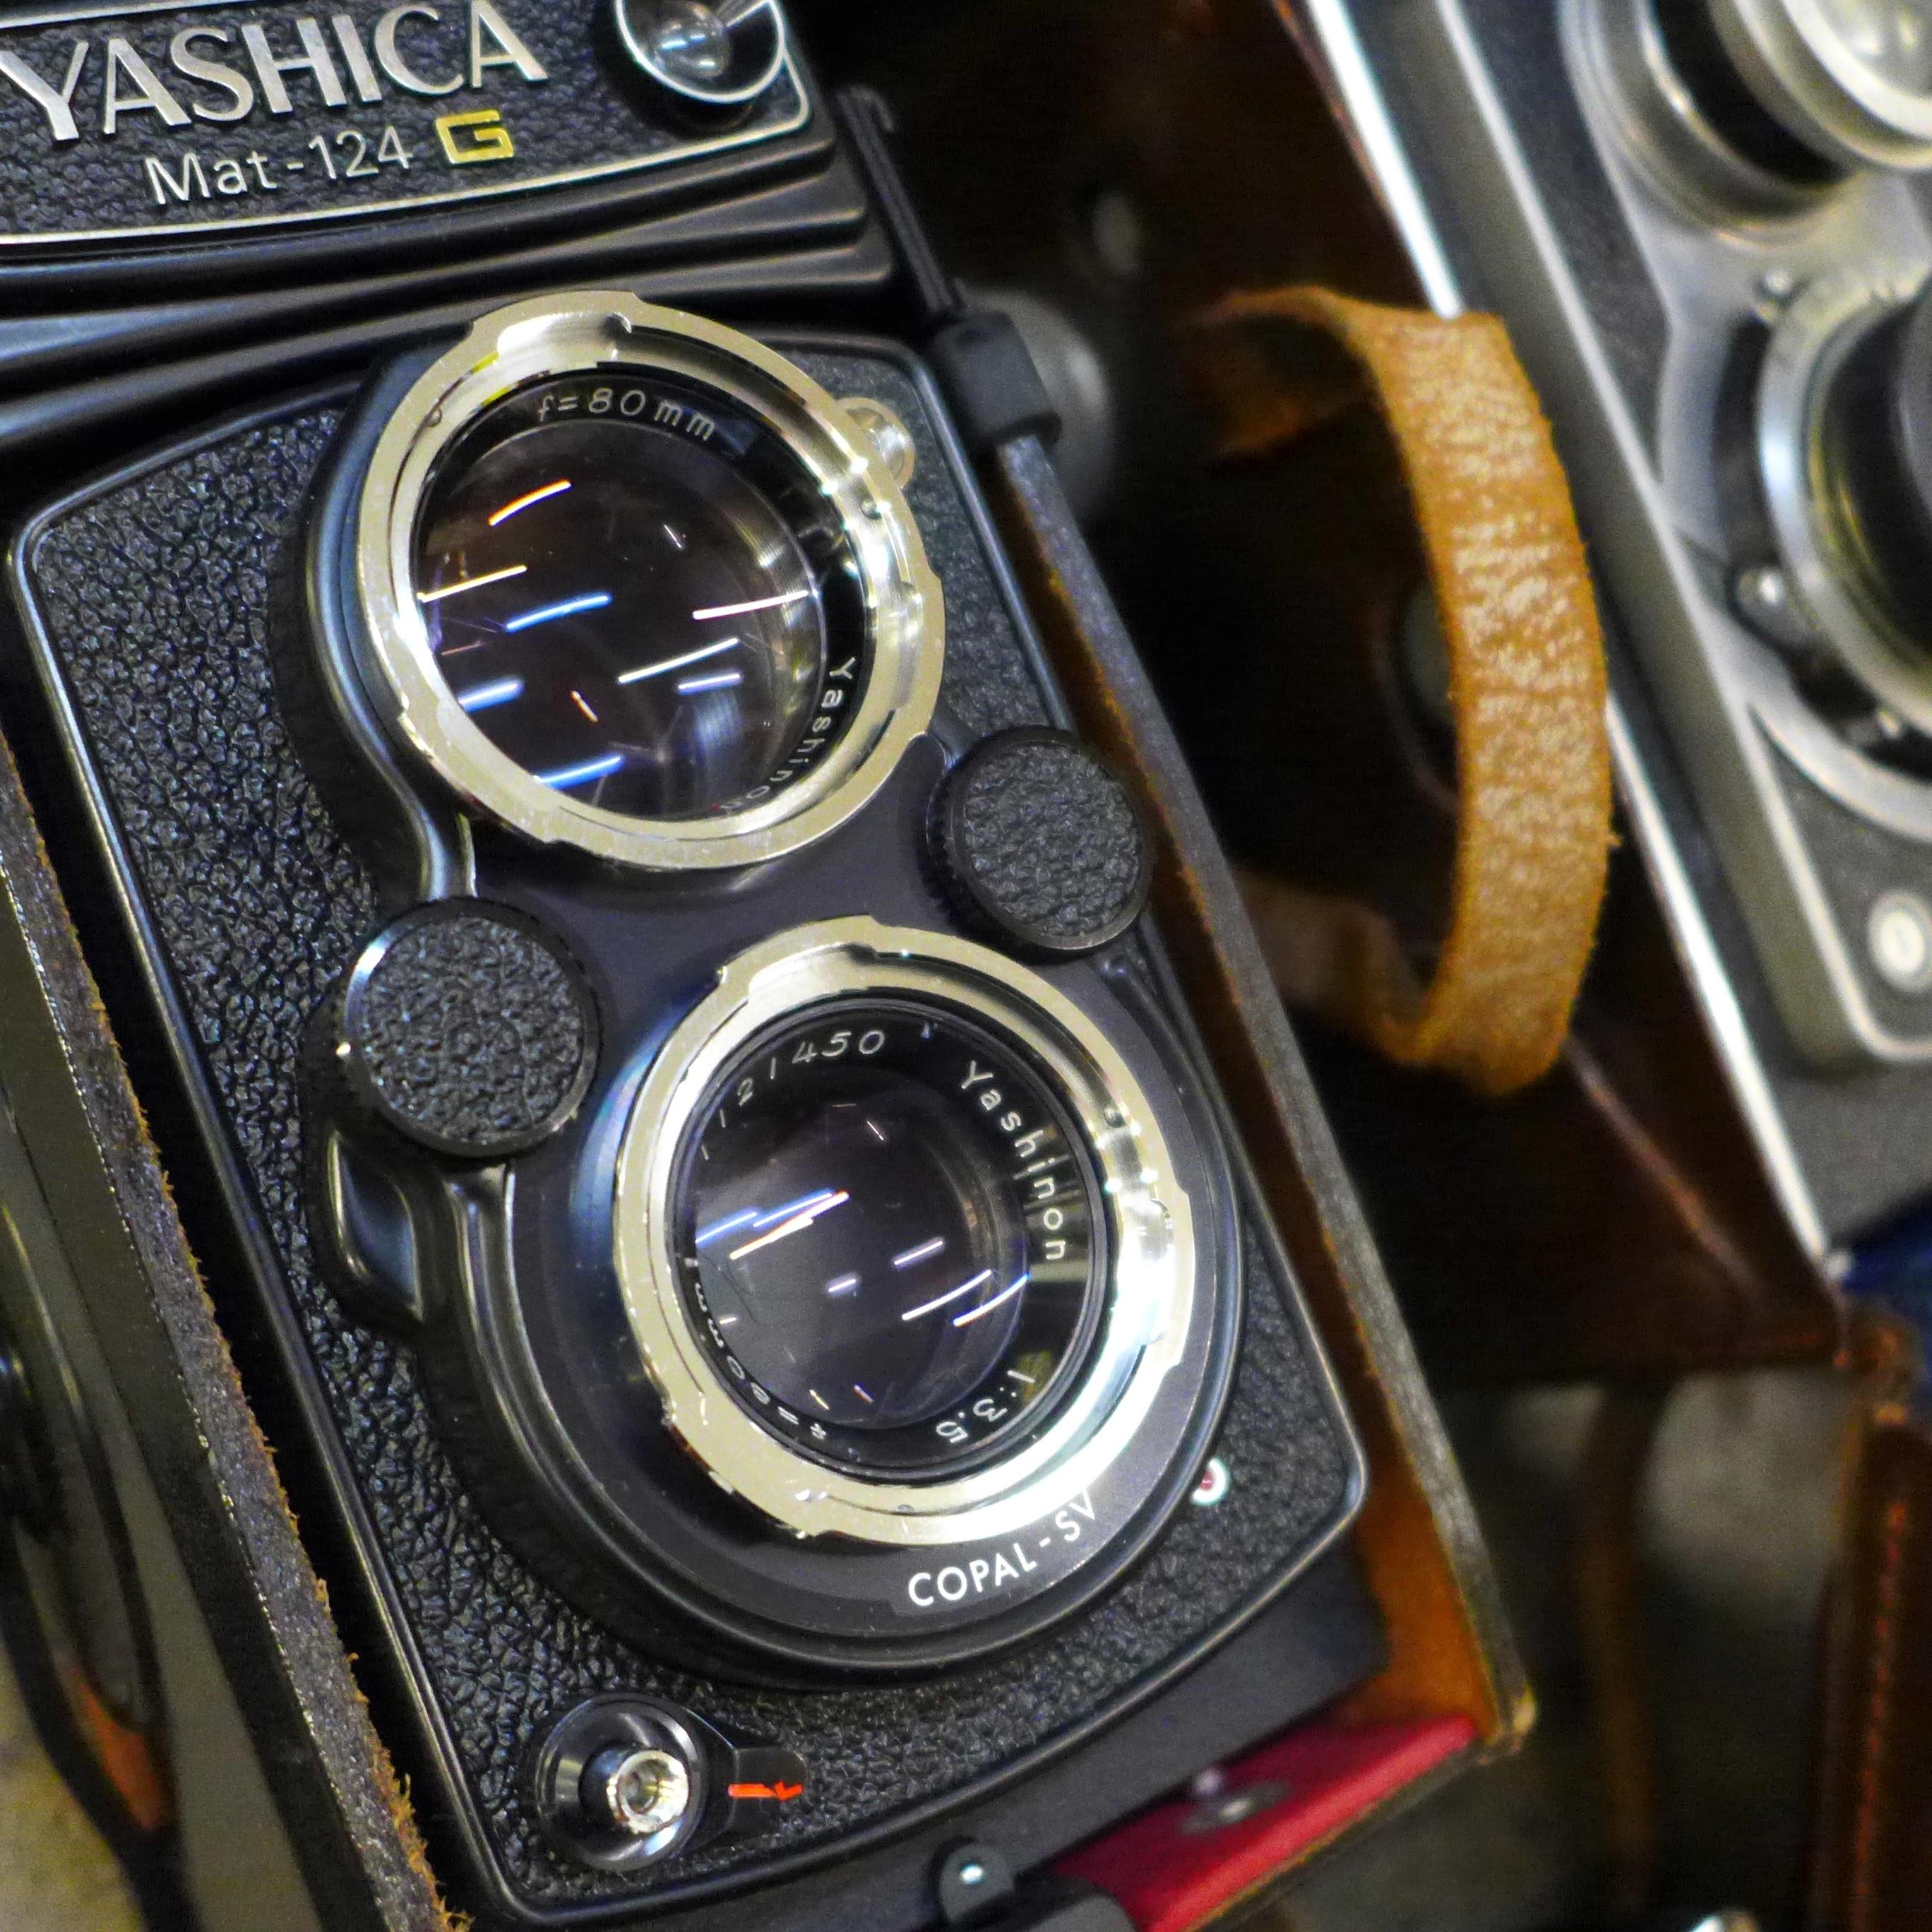 Five cameras; Yashica Mat-124 G, Nikon EM, Del Monza, Kodak Brownie, Zenit-E, a Jello cine camera, - Image 3 of 6